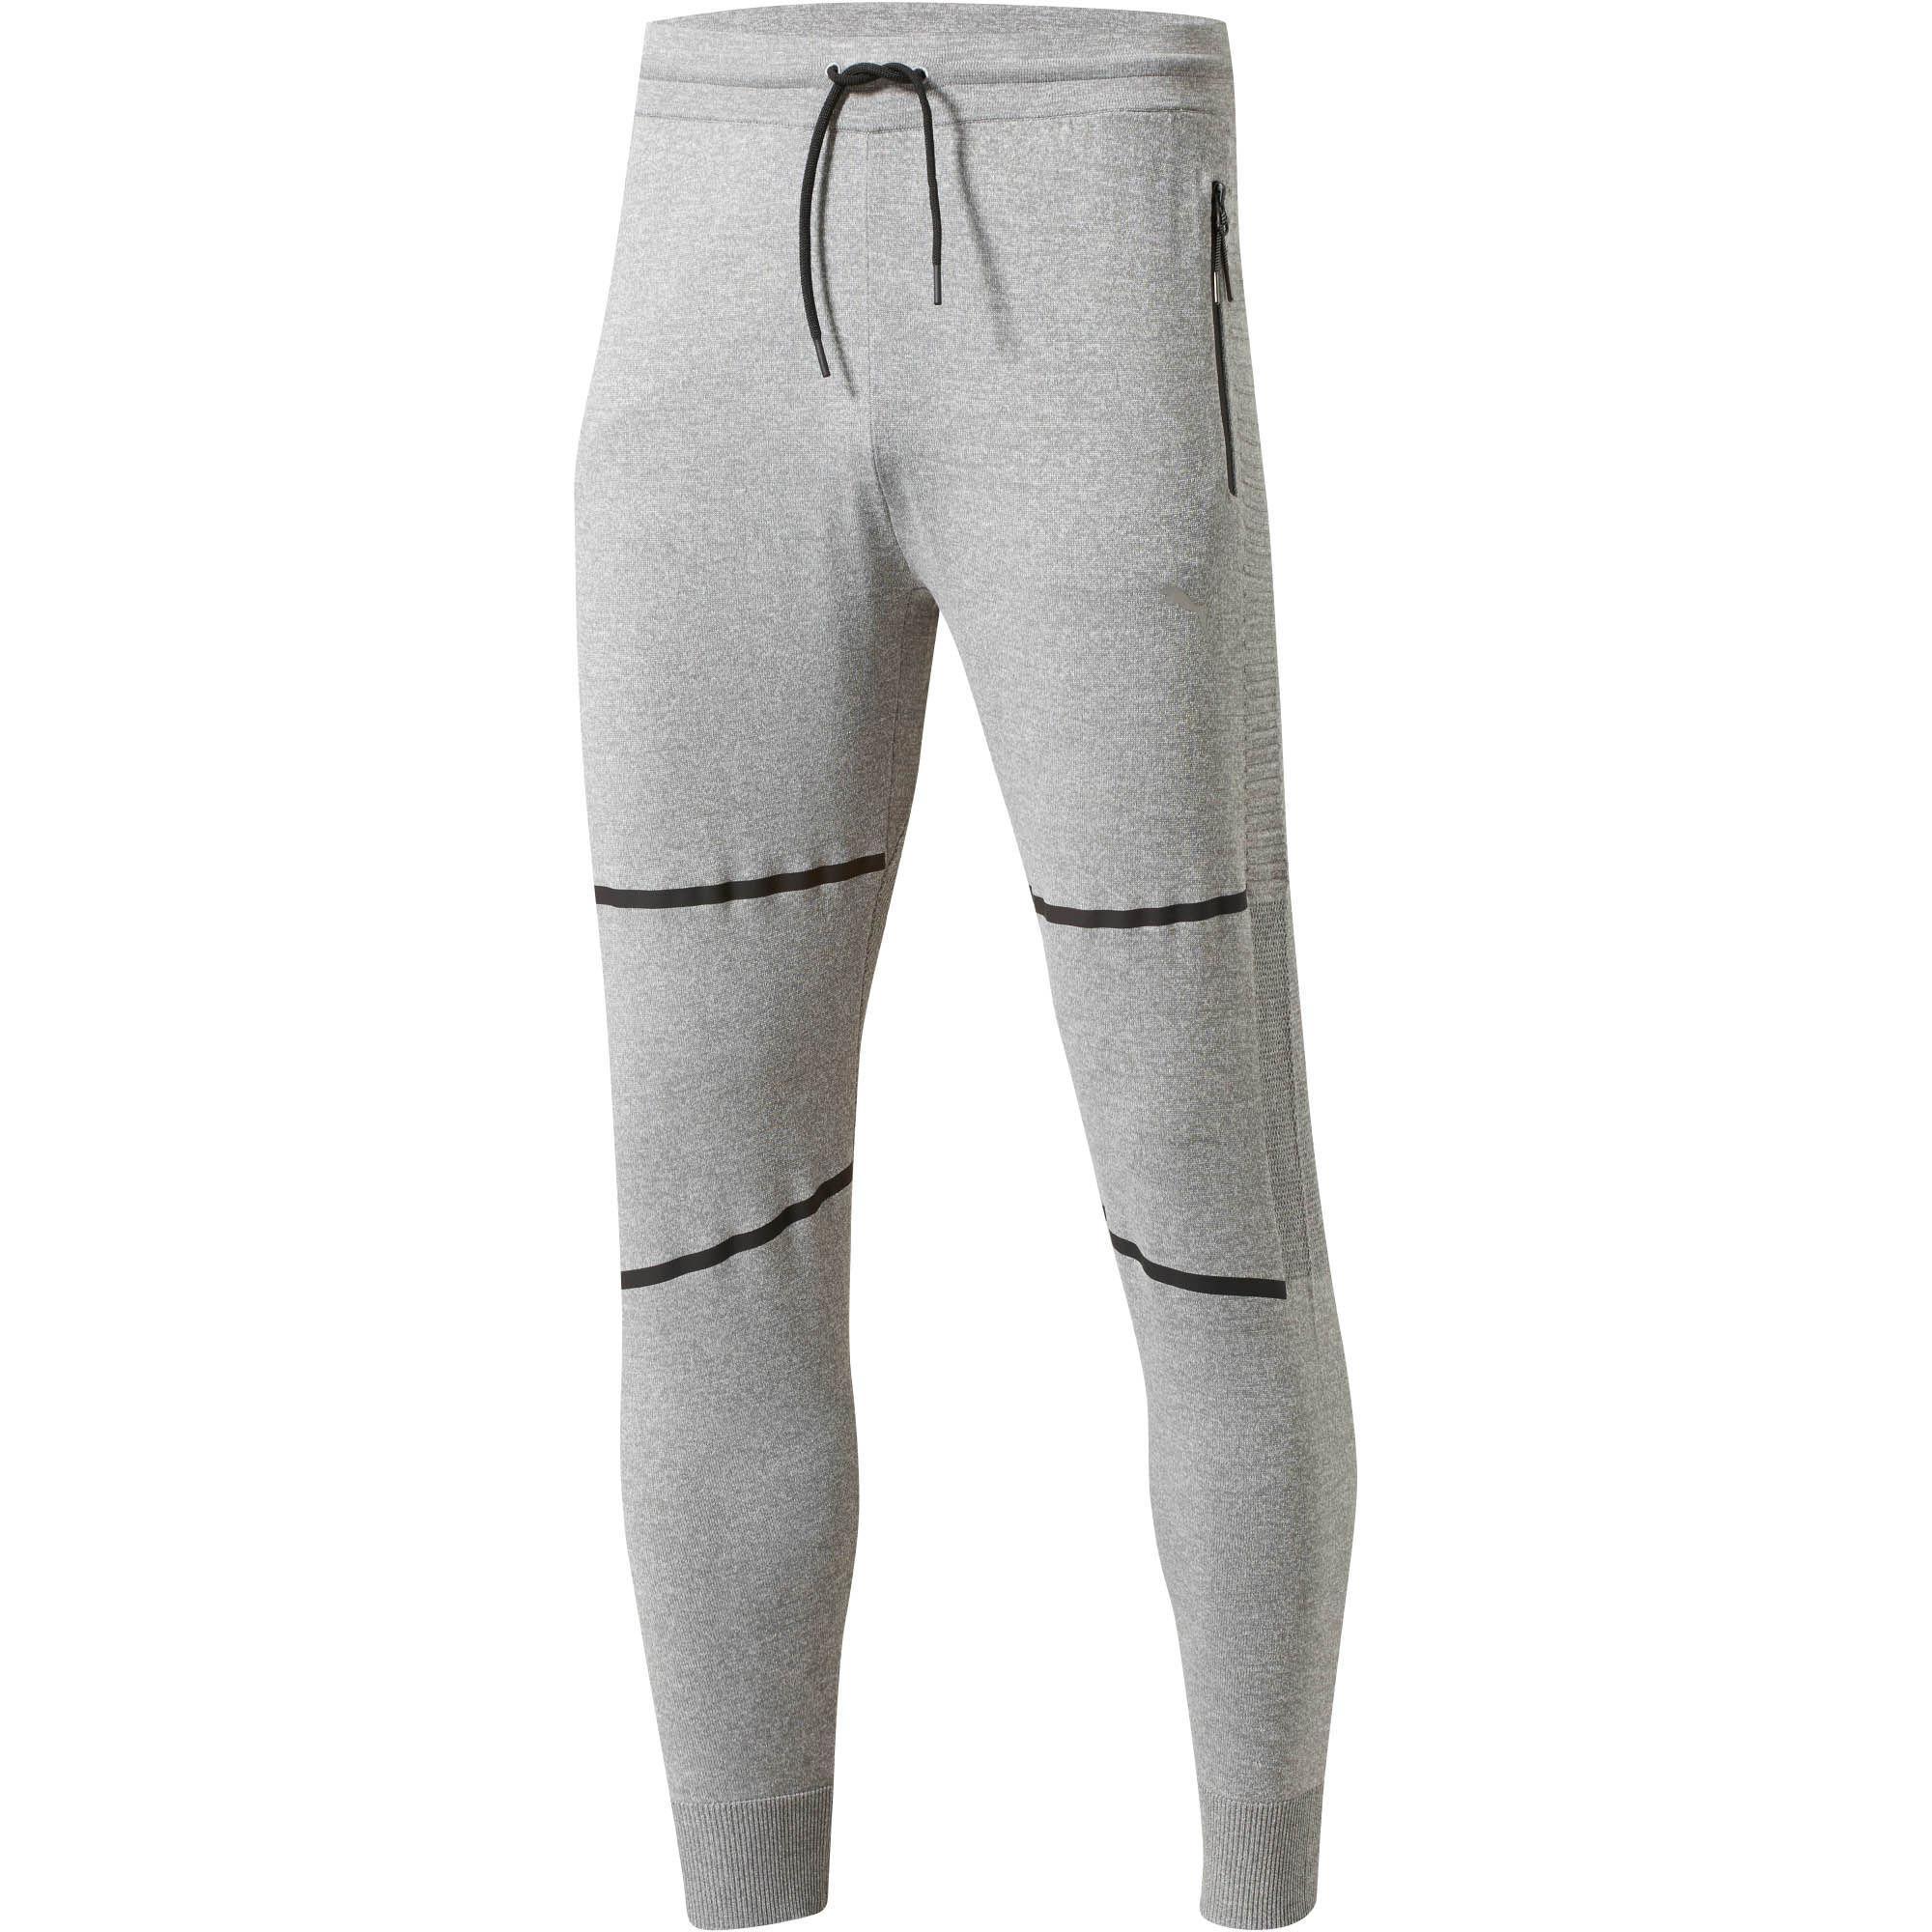 b4c2d7fdfd4c Lyst - PUMA Evoknit Men s Energy Trackster Pants in Gray for Men ...